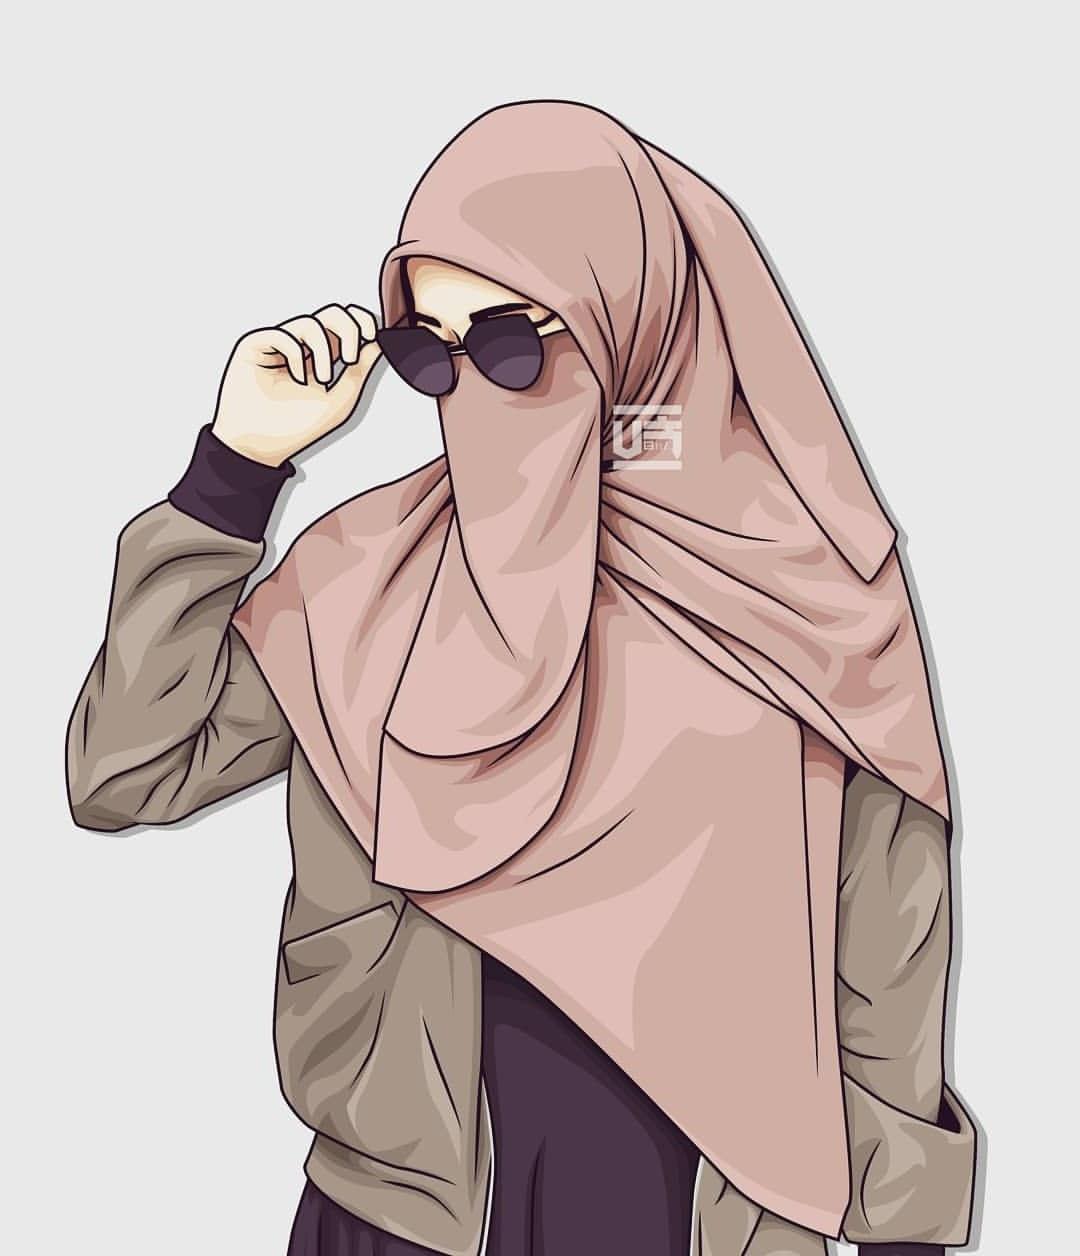 Design Muslimah Bercadar Kartun Irdz 1000 Gambar Kartun Muslimah Cantik Bercadar Kacamata El